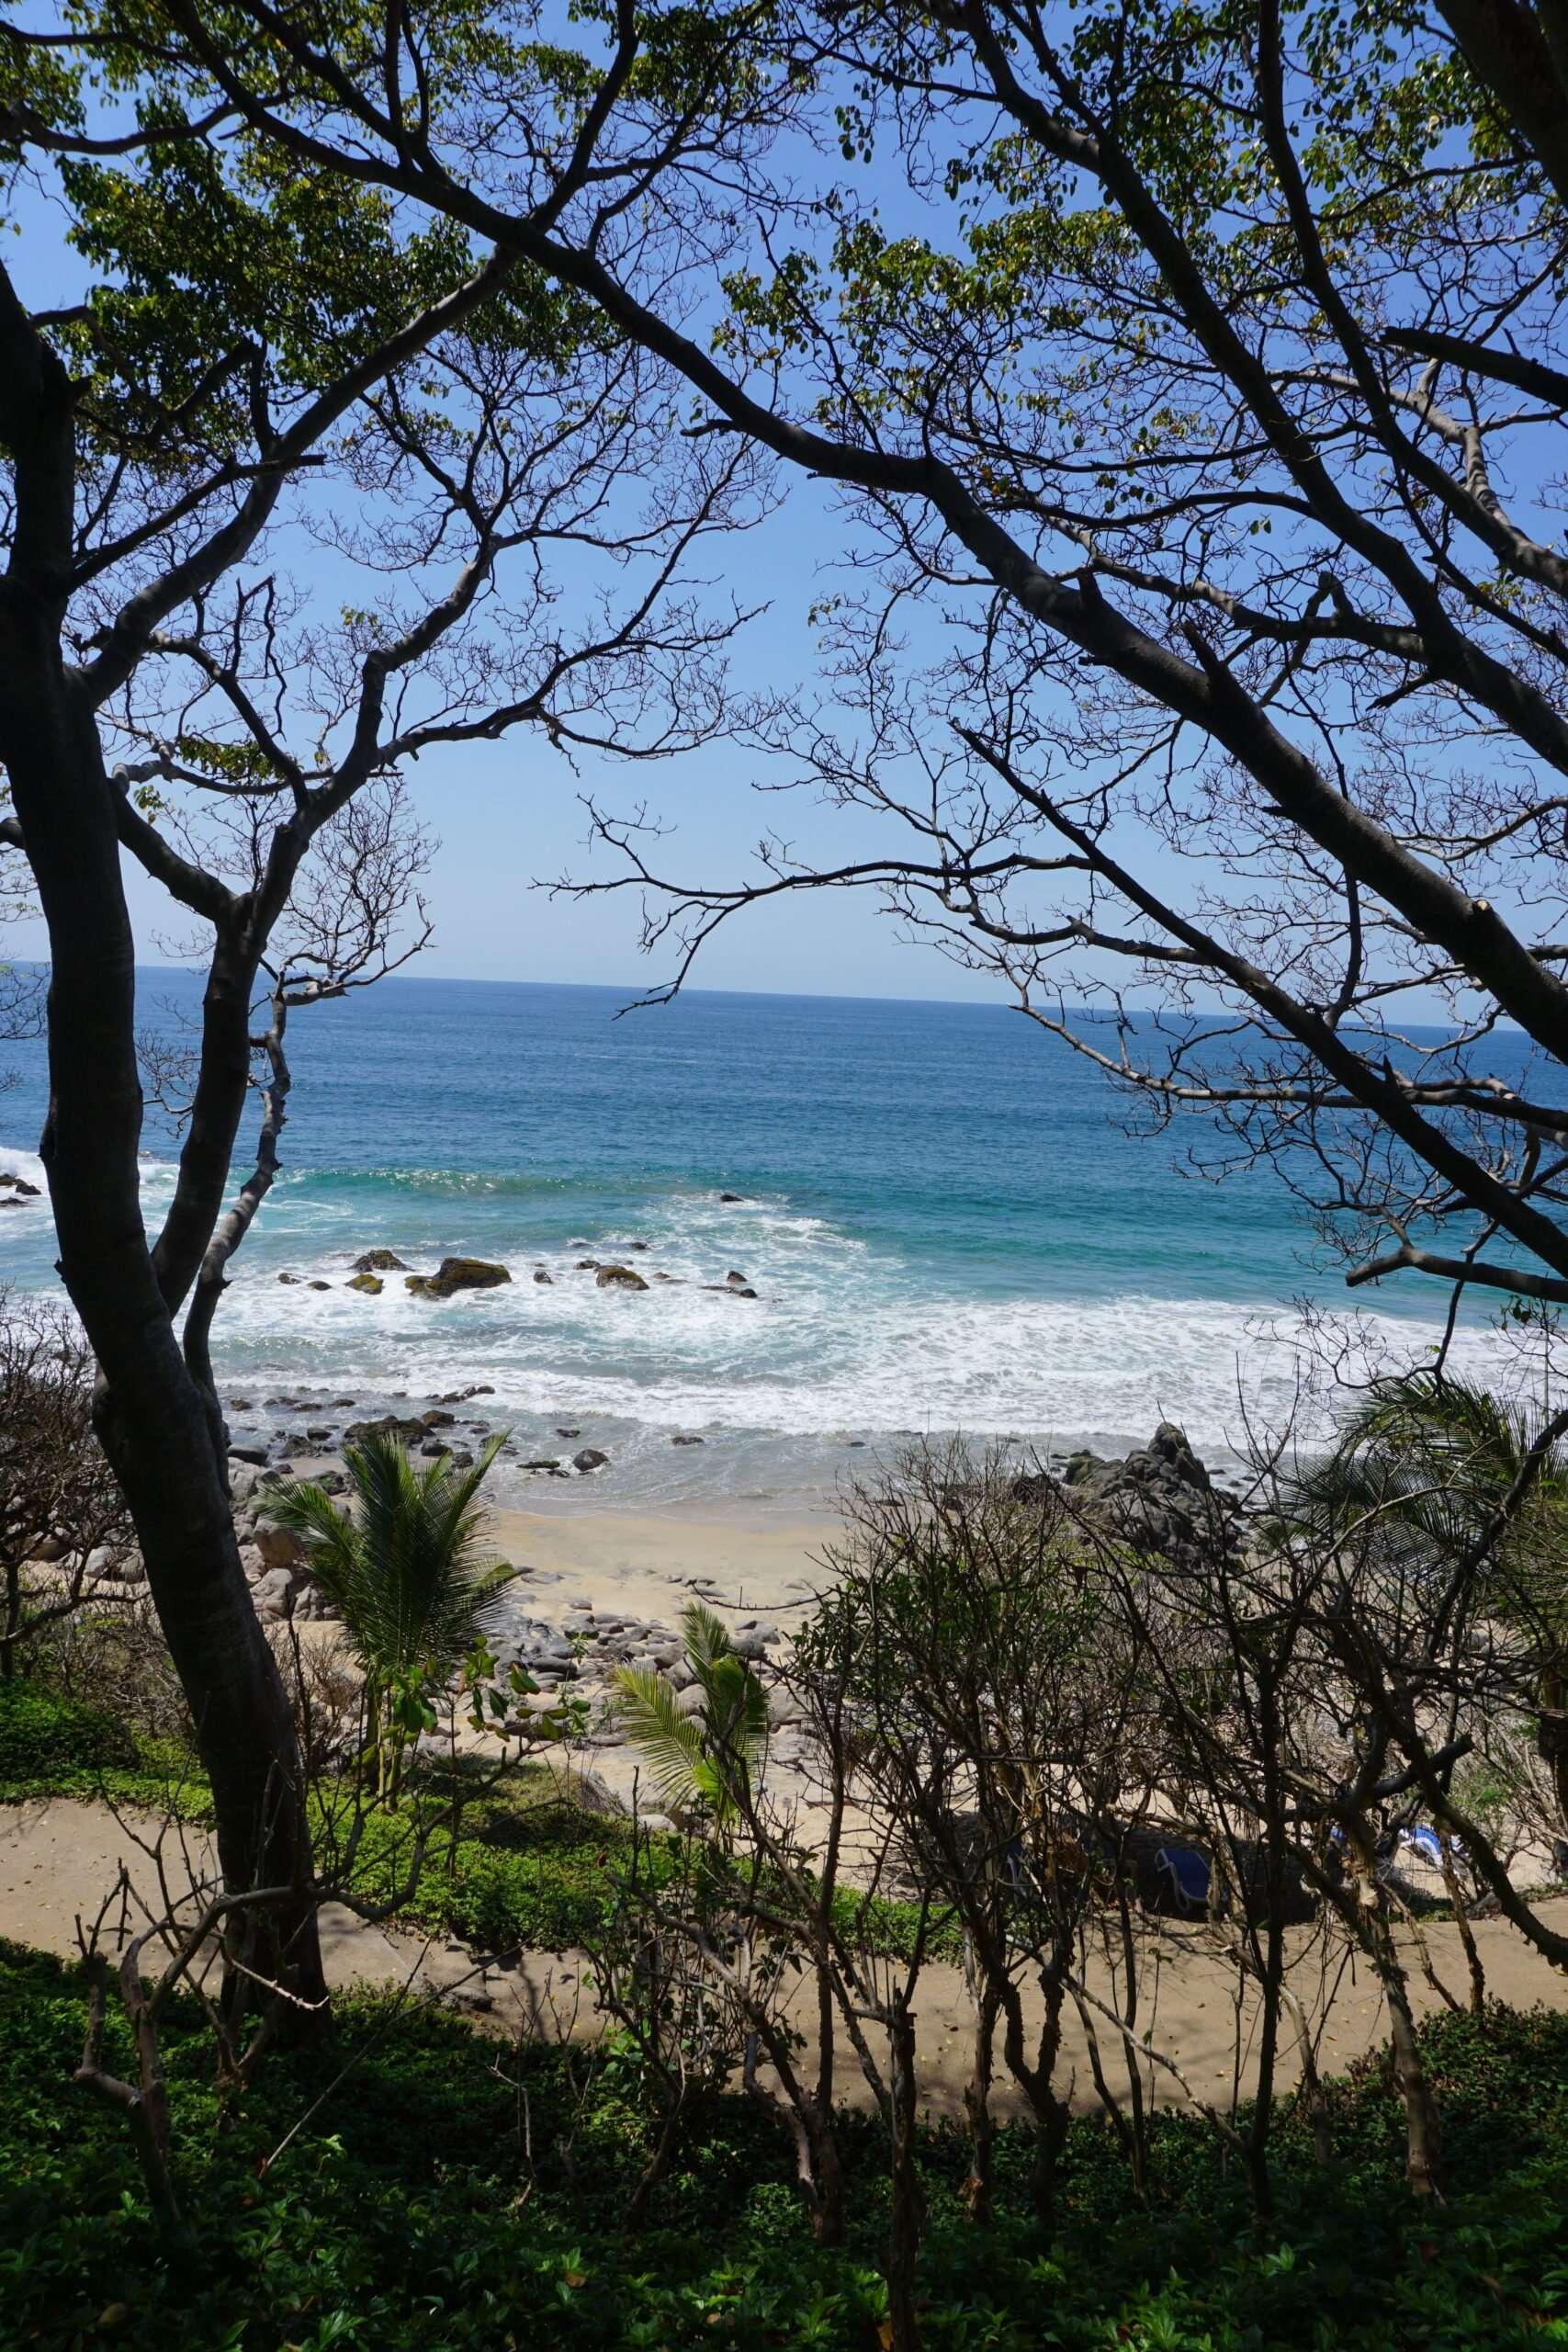 haramara retreat path to the ocean